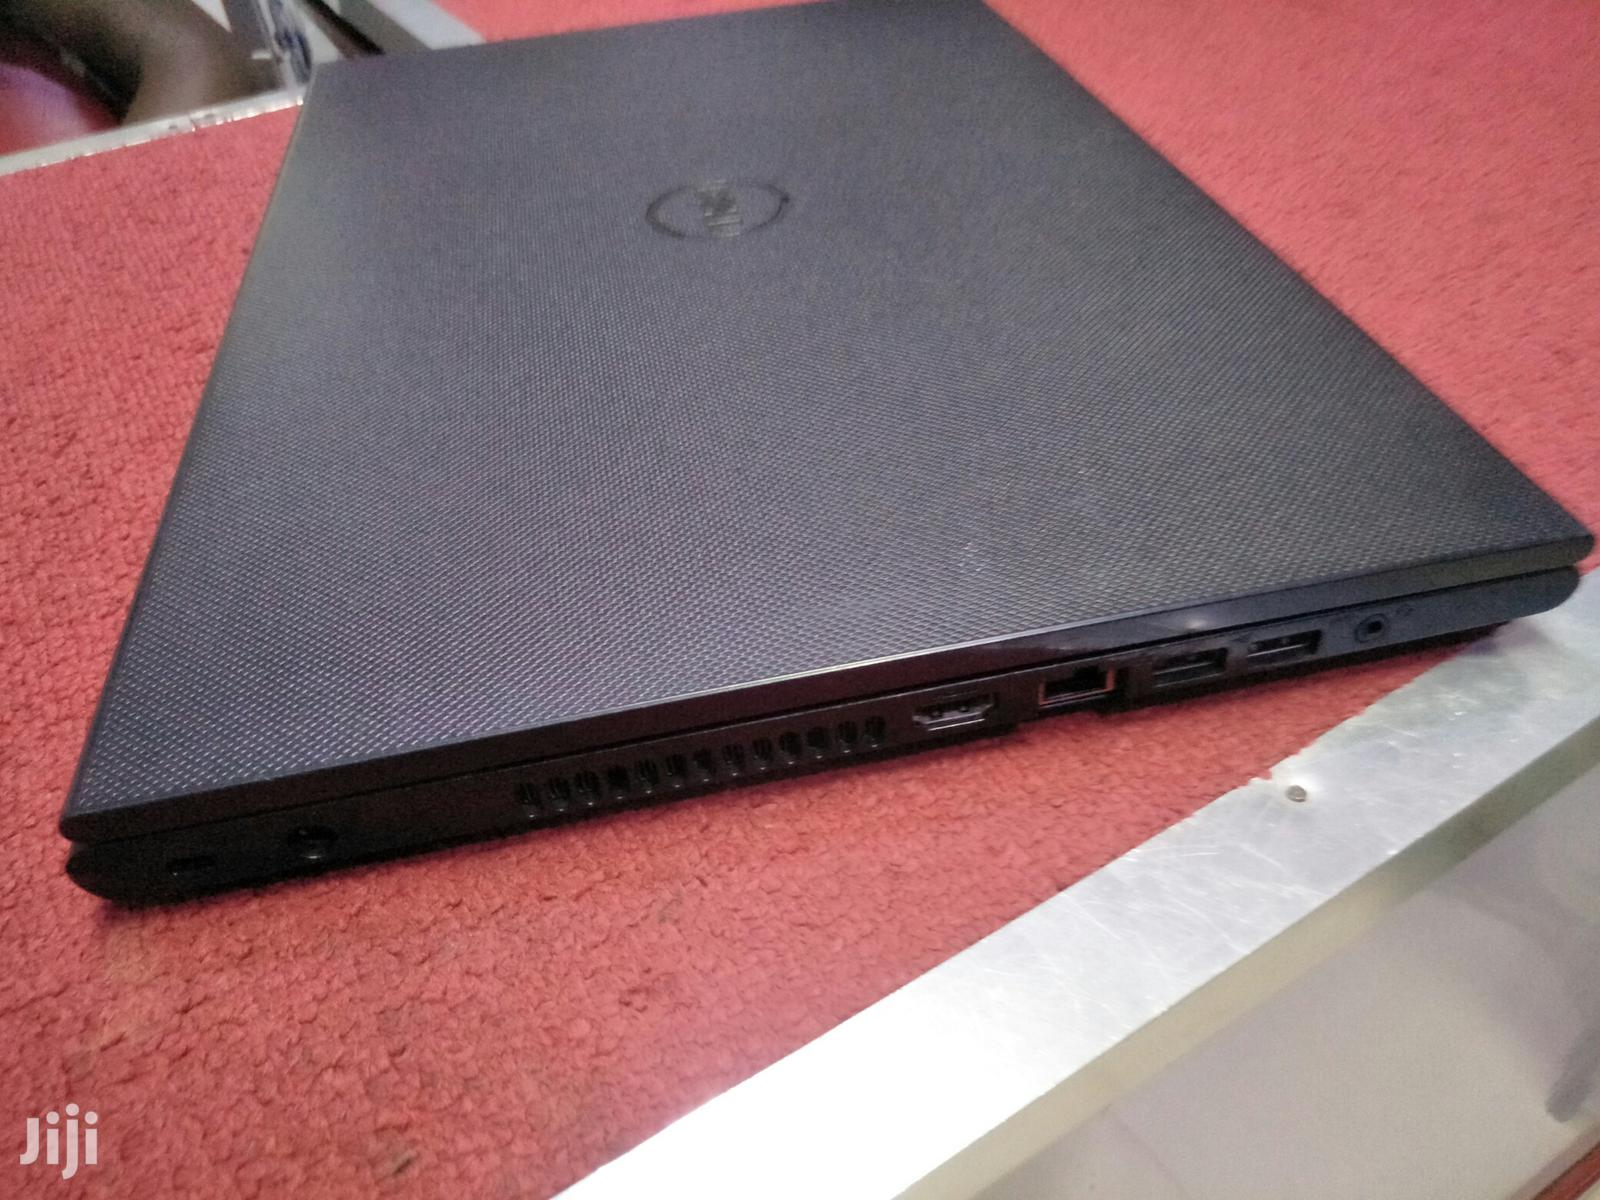 Archive: Dell Inspiron 15 3000 Series. Intel Core I5-5200u 2gb NVIDIA GEFORCE